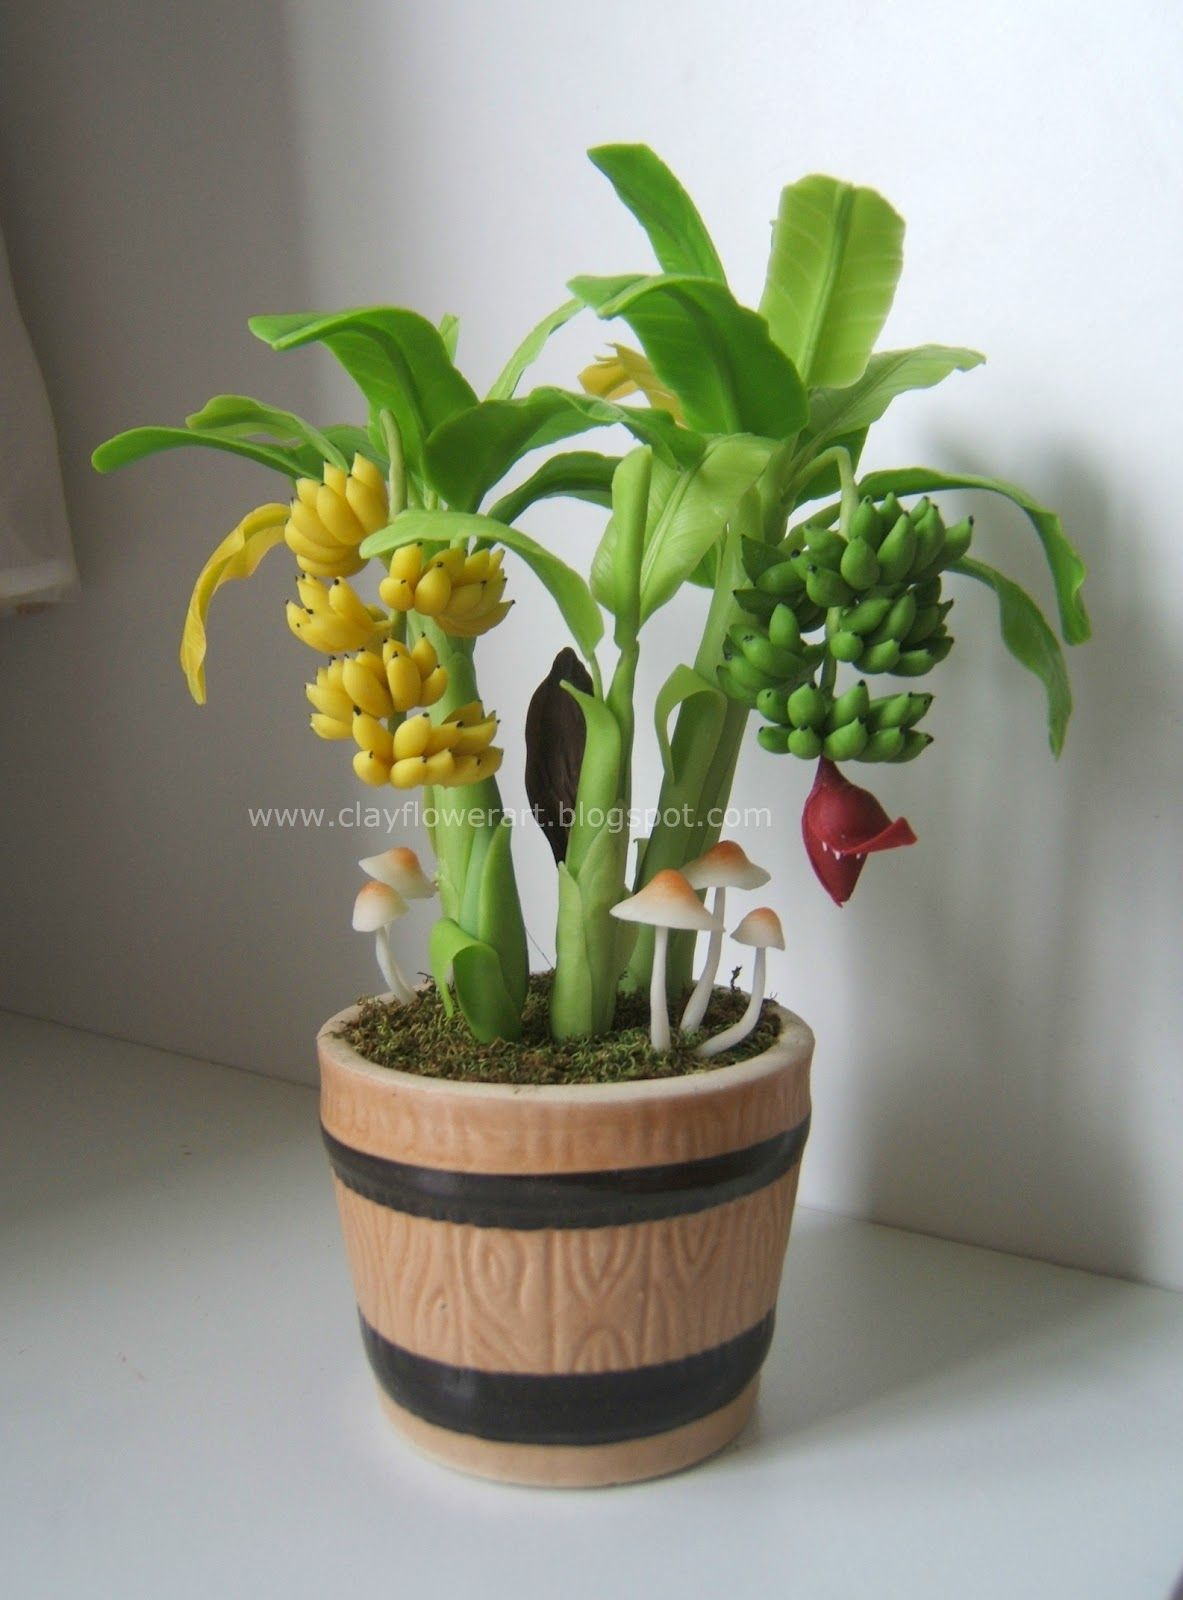 Miniature Banana Plant Banana Plants Miniature Fruit Trees Plants